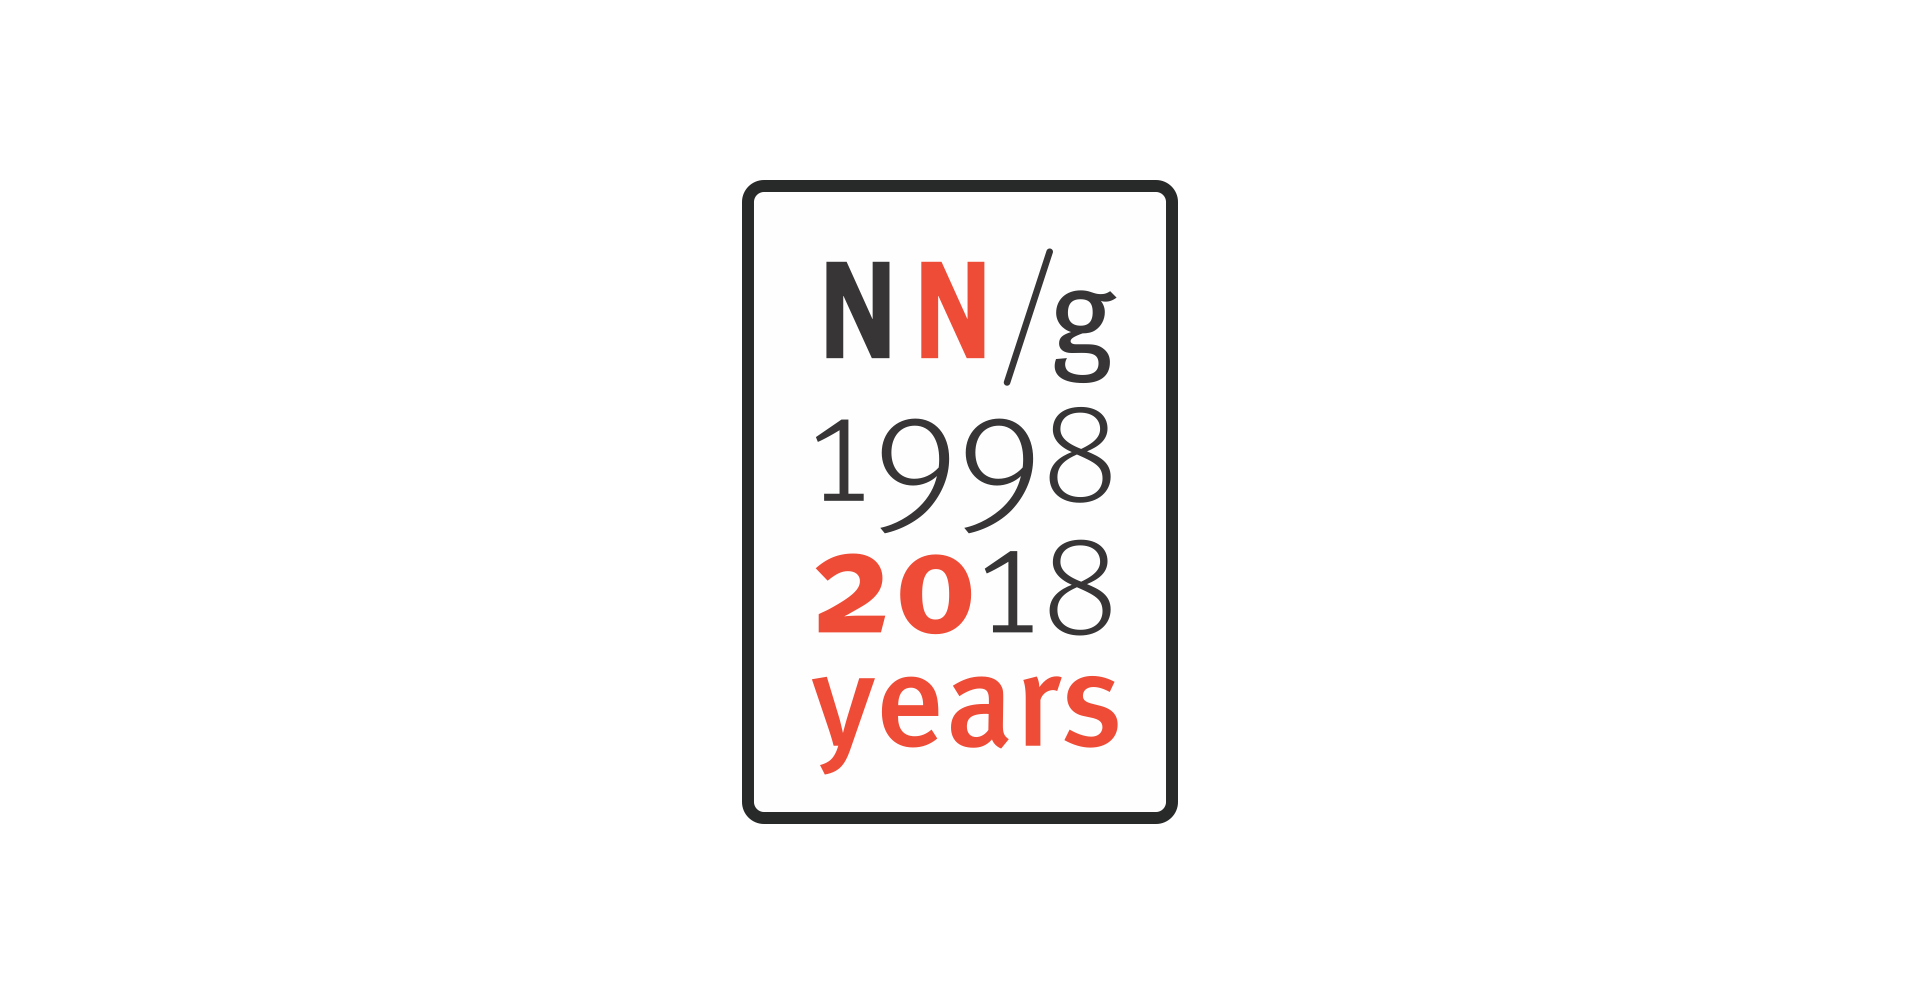 Nielsen Norman Group: 20 Years